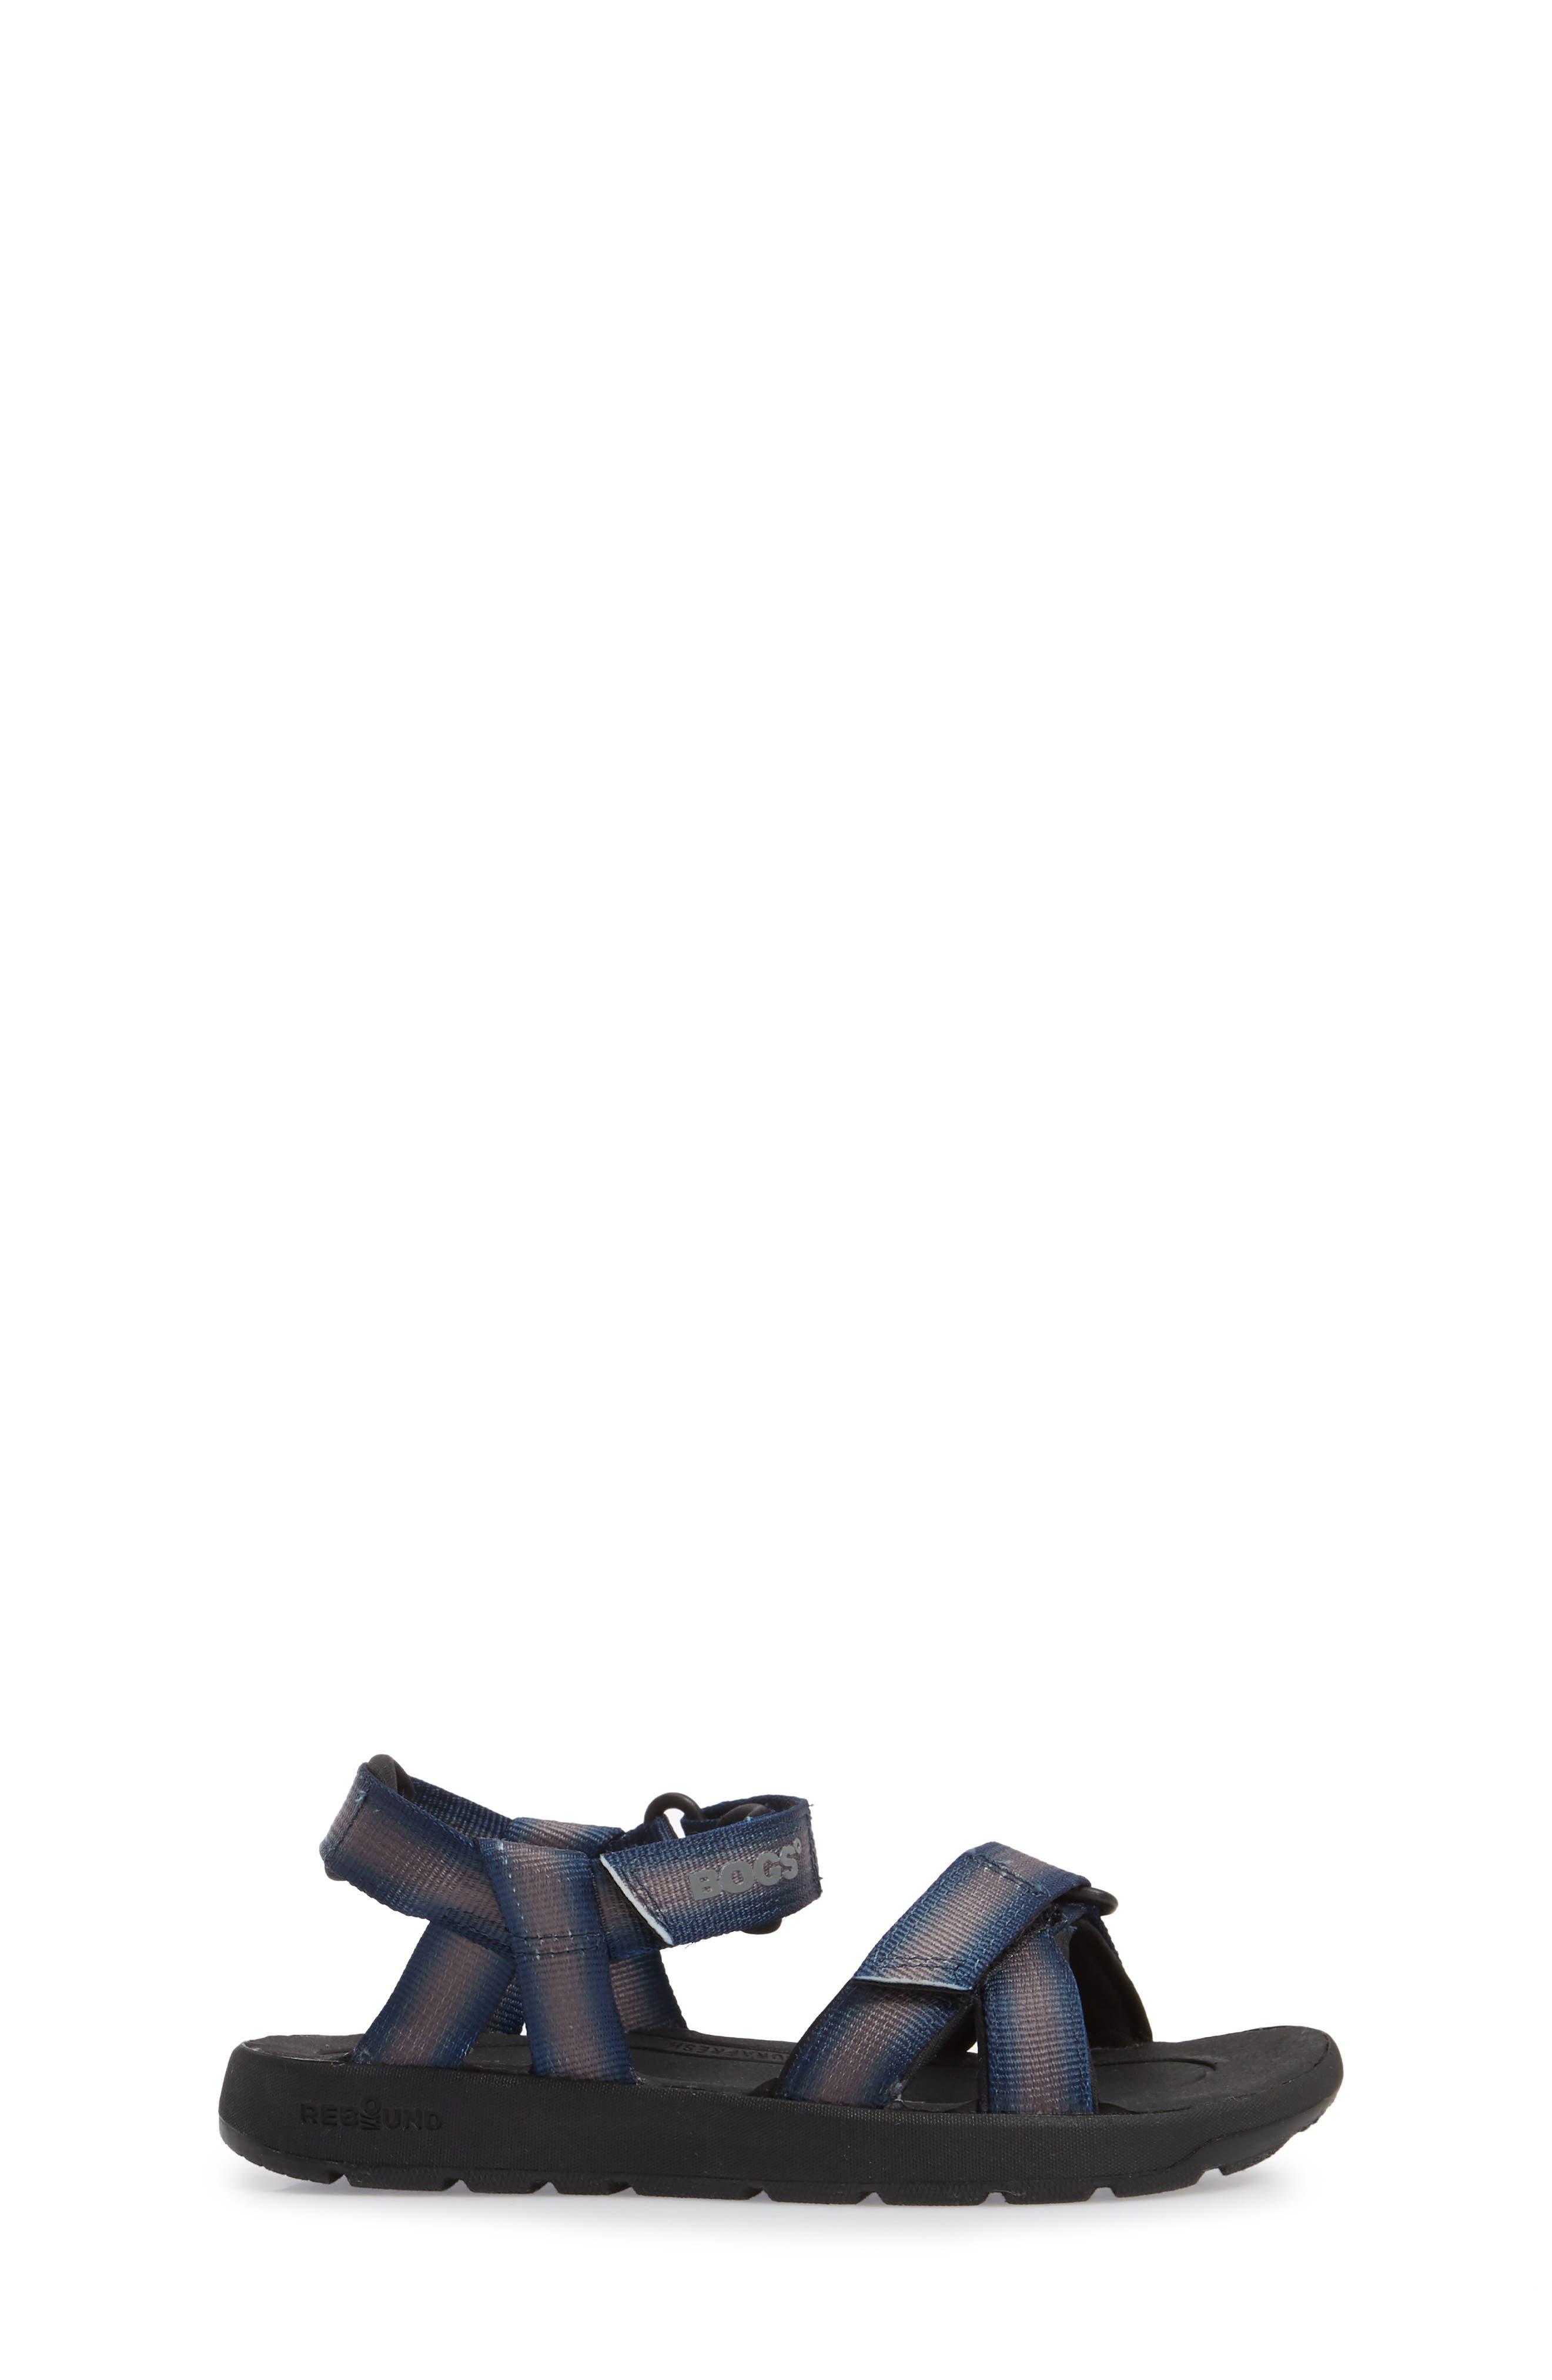 BOGS, Rio Sunrise Stripe Sandal, Alternate thumbnail 3, color, 062